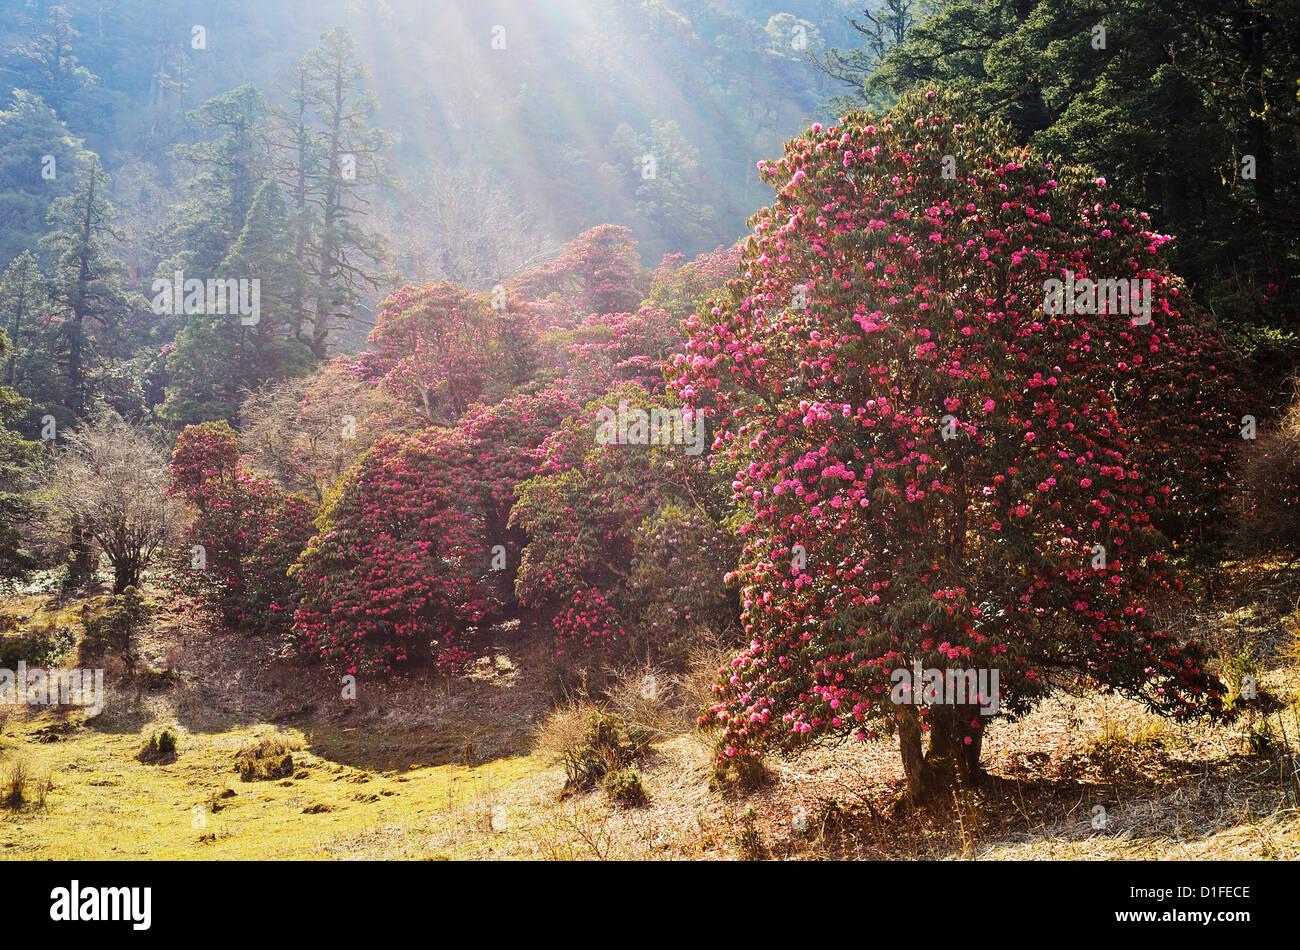 Rhododendron forest, near Titi, Annapurna Conservation Area, Dhawalagiri (Dhaulagiri), Western Region (Pashchimanchal), - Stock Image